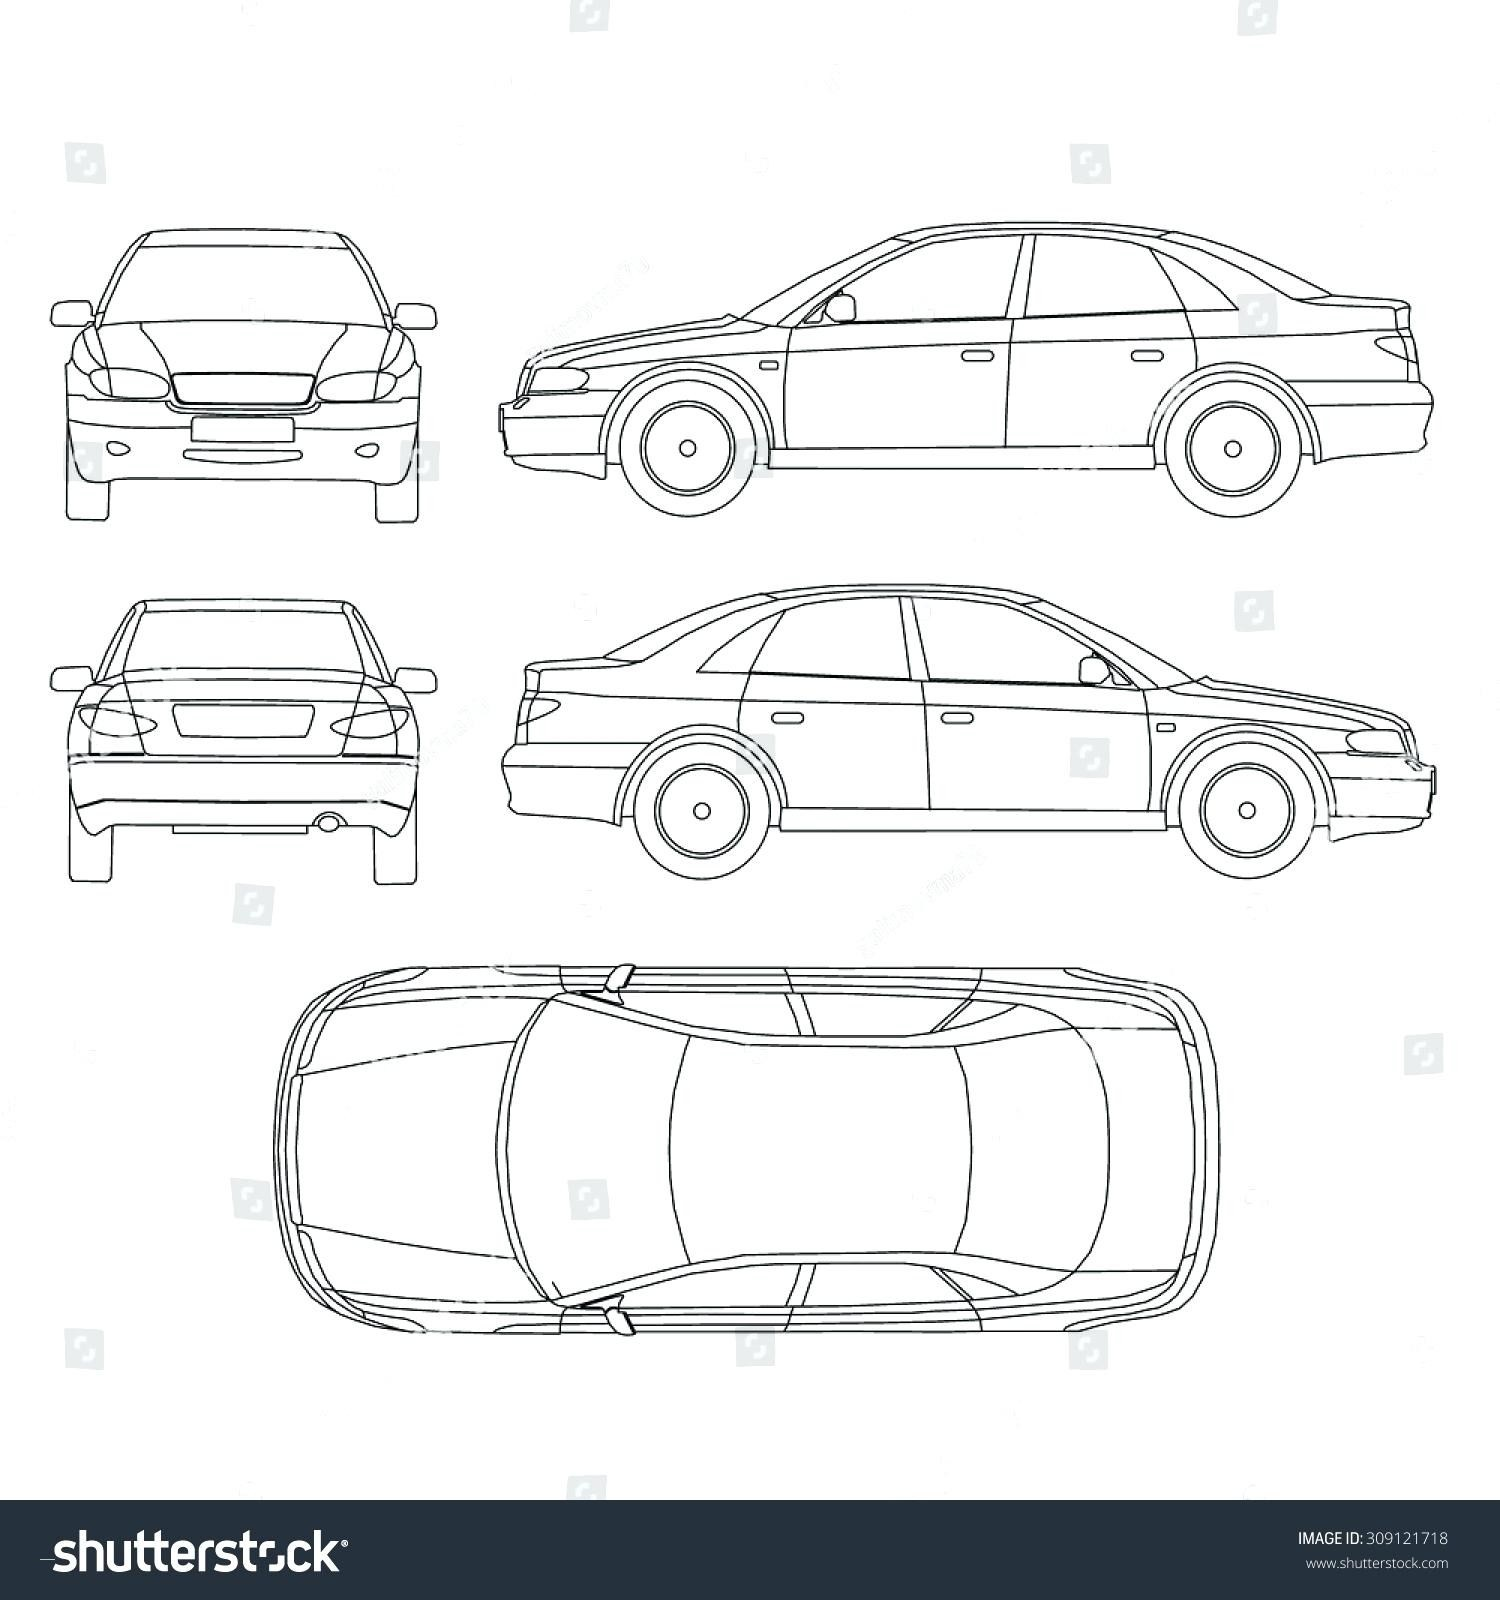 Car Sides Diagram Trusted Wiring Axle Suv Damage Diagrams Simple Schema